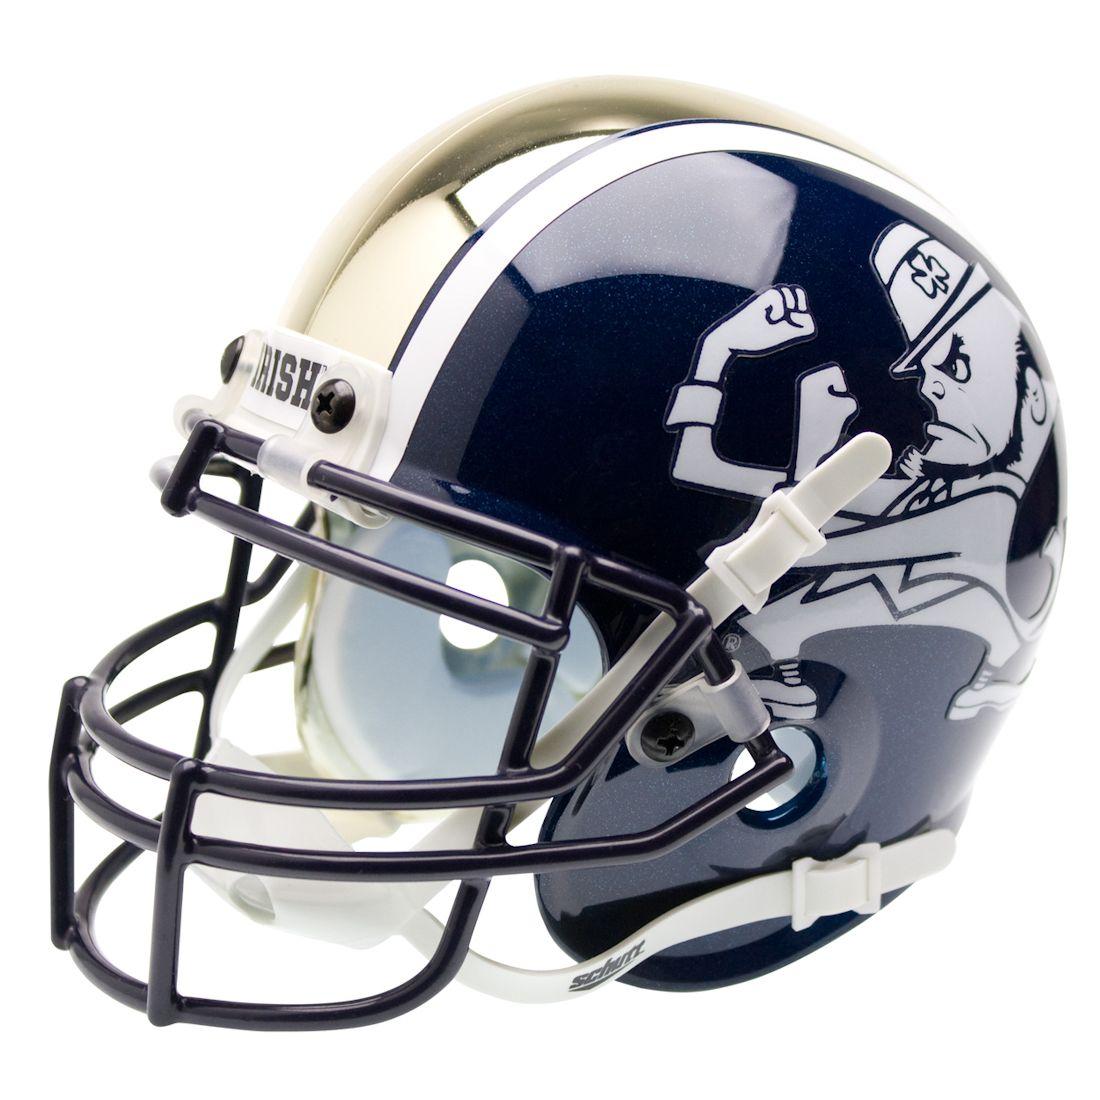 NCAA Air Force Falcons Collectible Mini Helmet